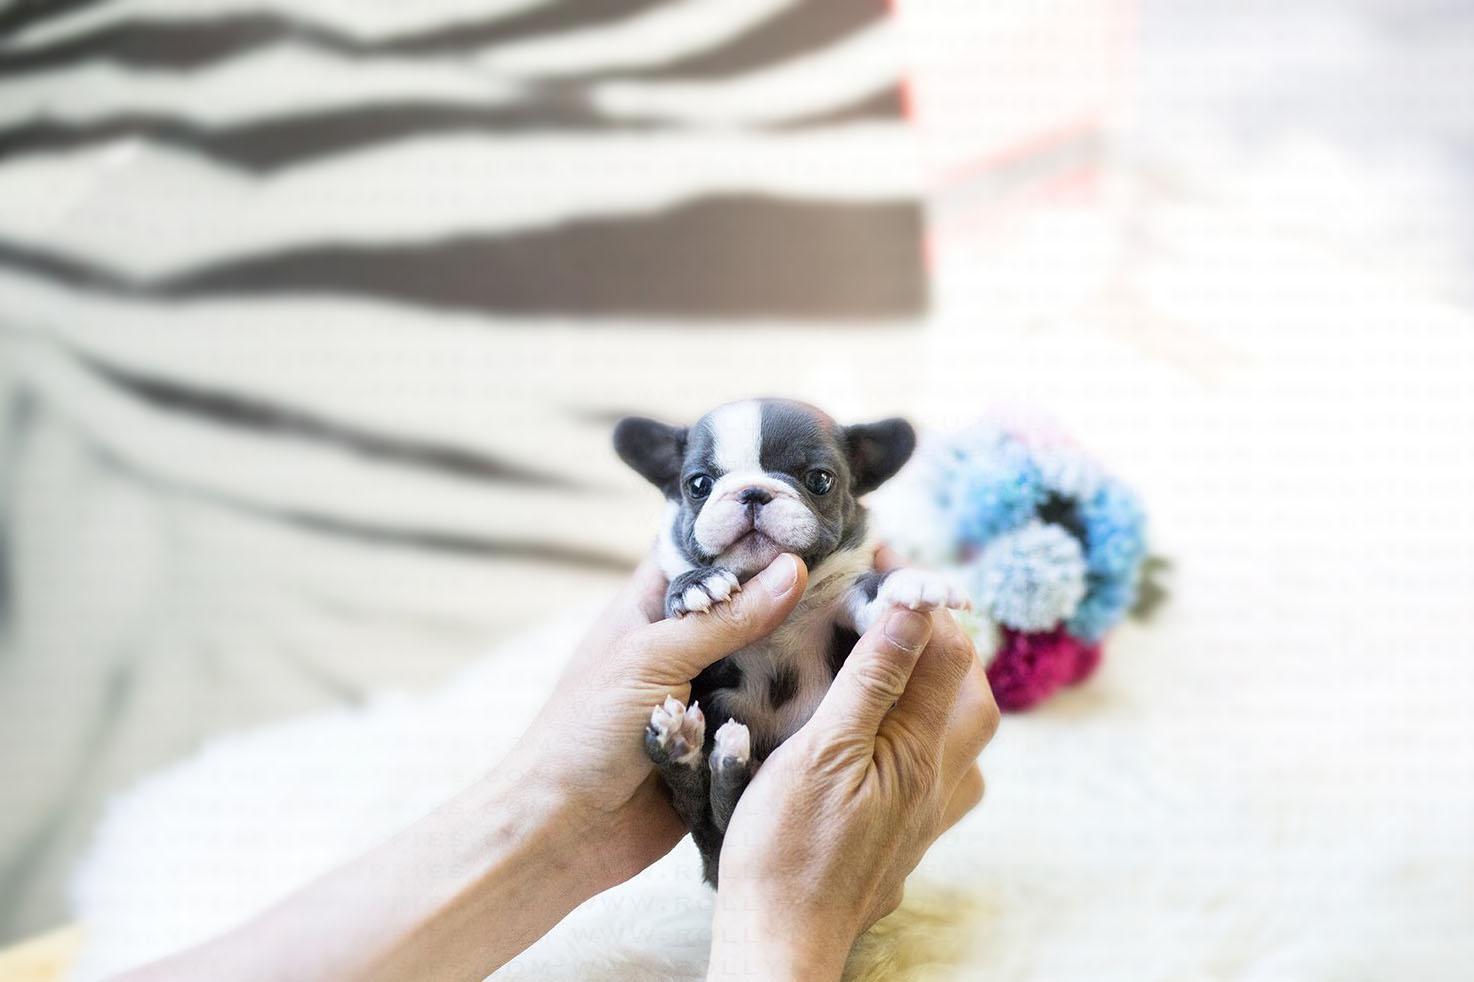 Igloo Teacup French Bulldog for Sale